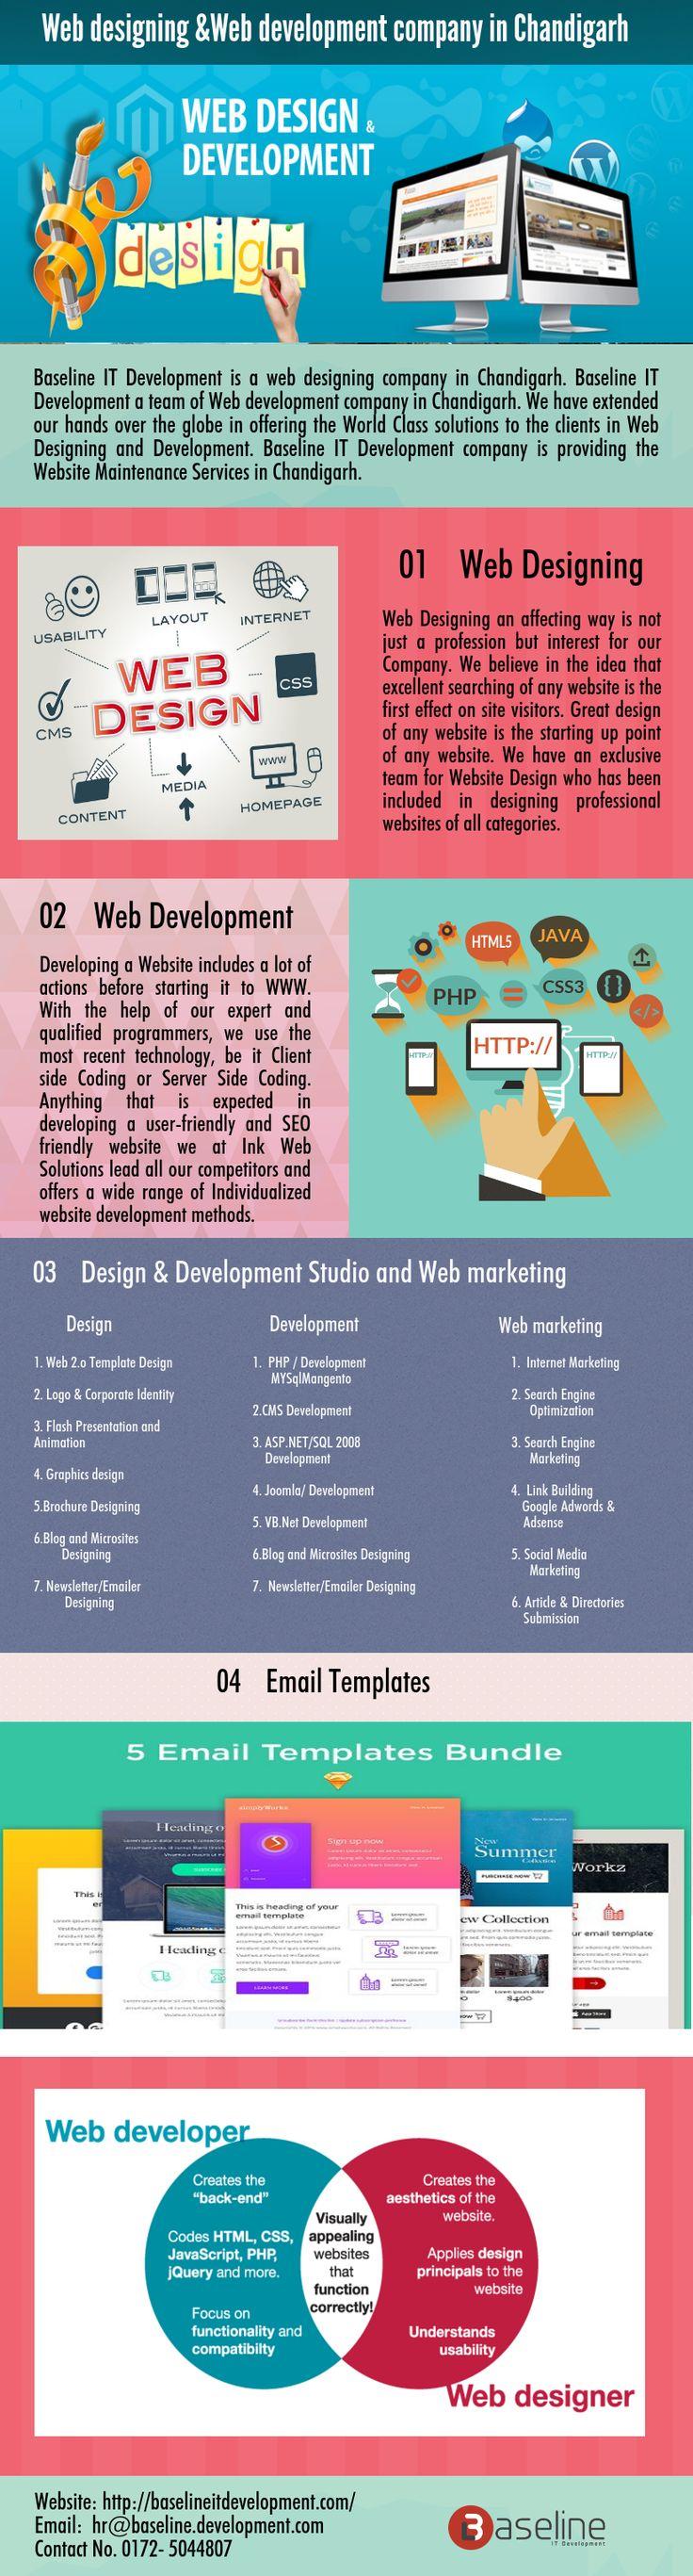 #Web_designing_company_in_chandigarh #web_development_company_in_chandigarh